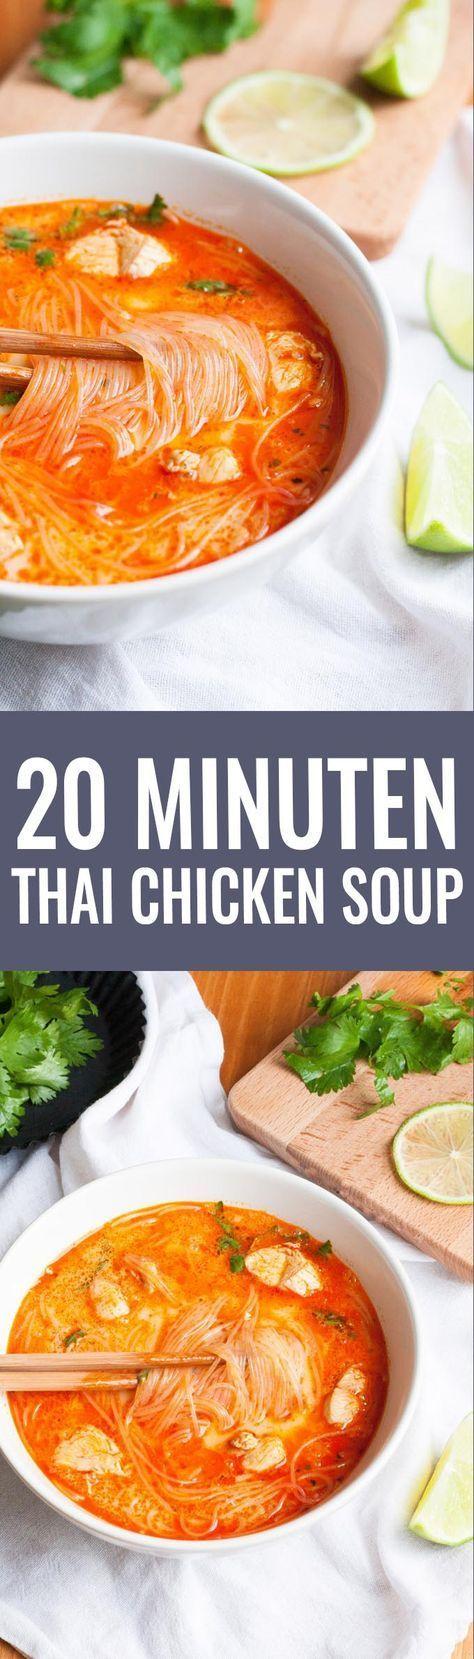 20 Minuten Thai Chicken Soup - Kochkarussell.com (Paleo Soup)